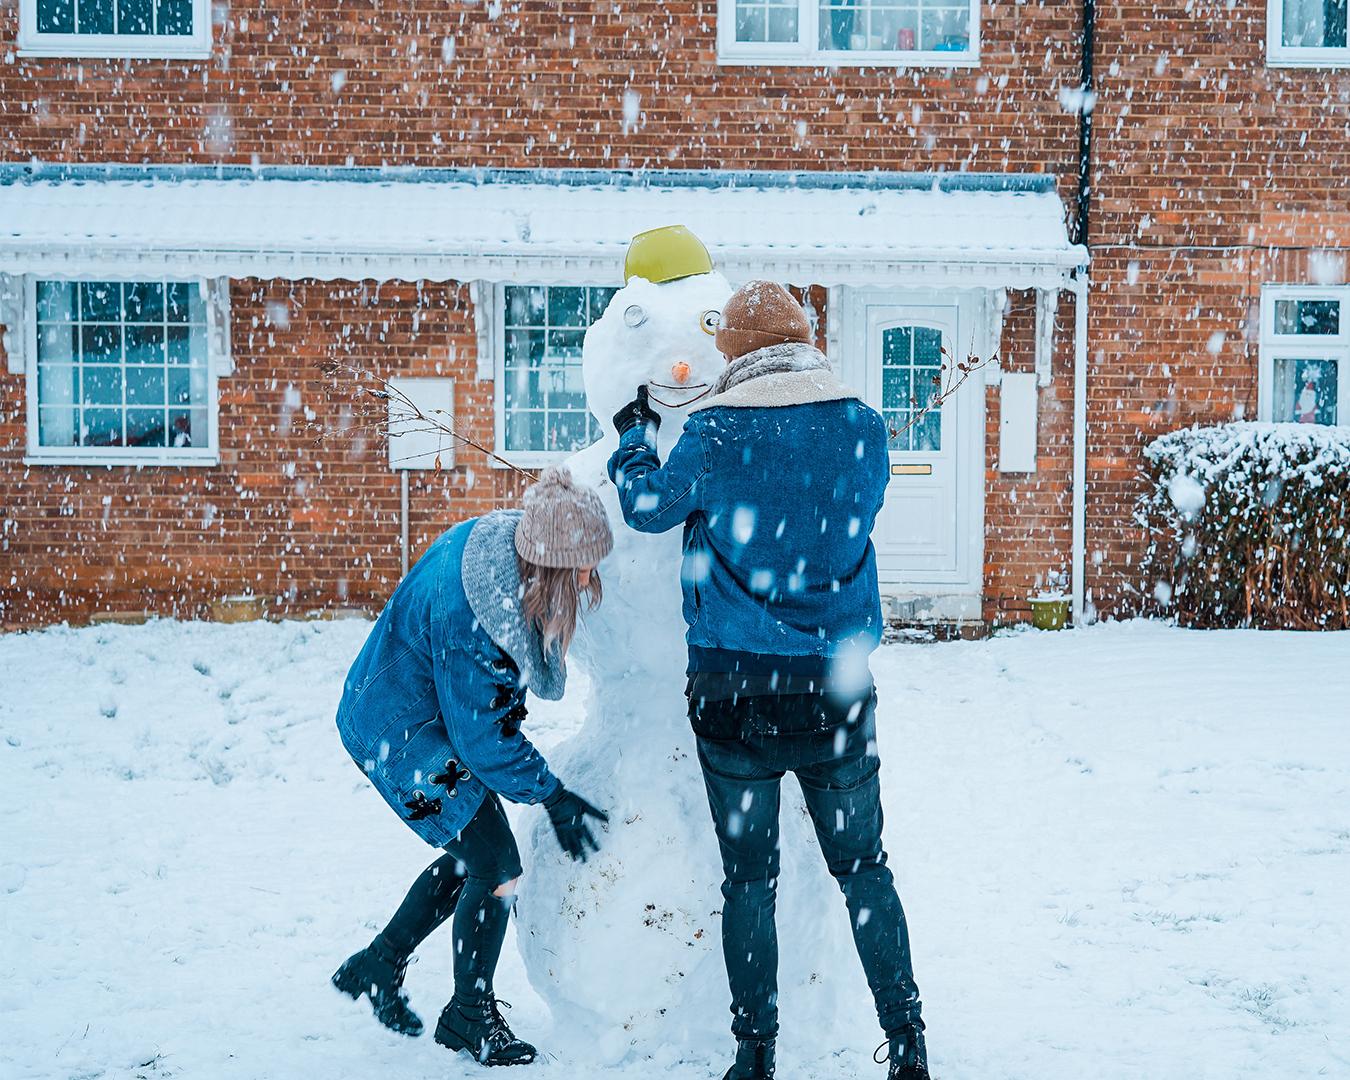 fotografera-vintern-iphone-fototips-framkalla